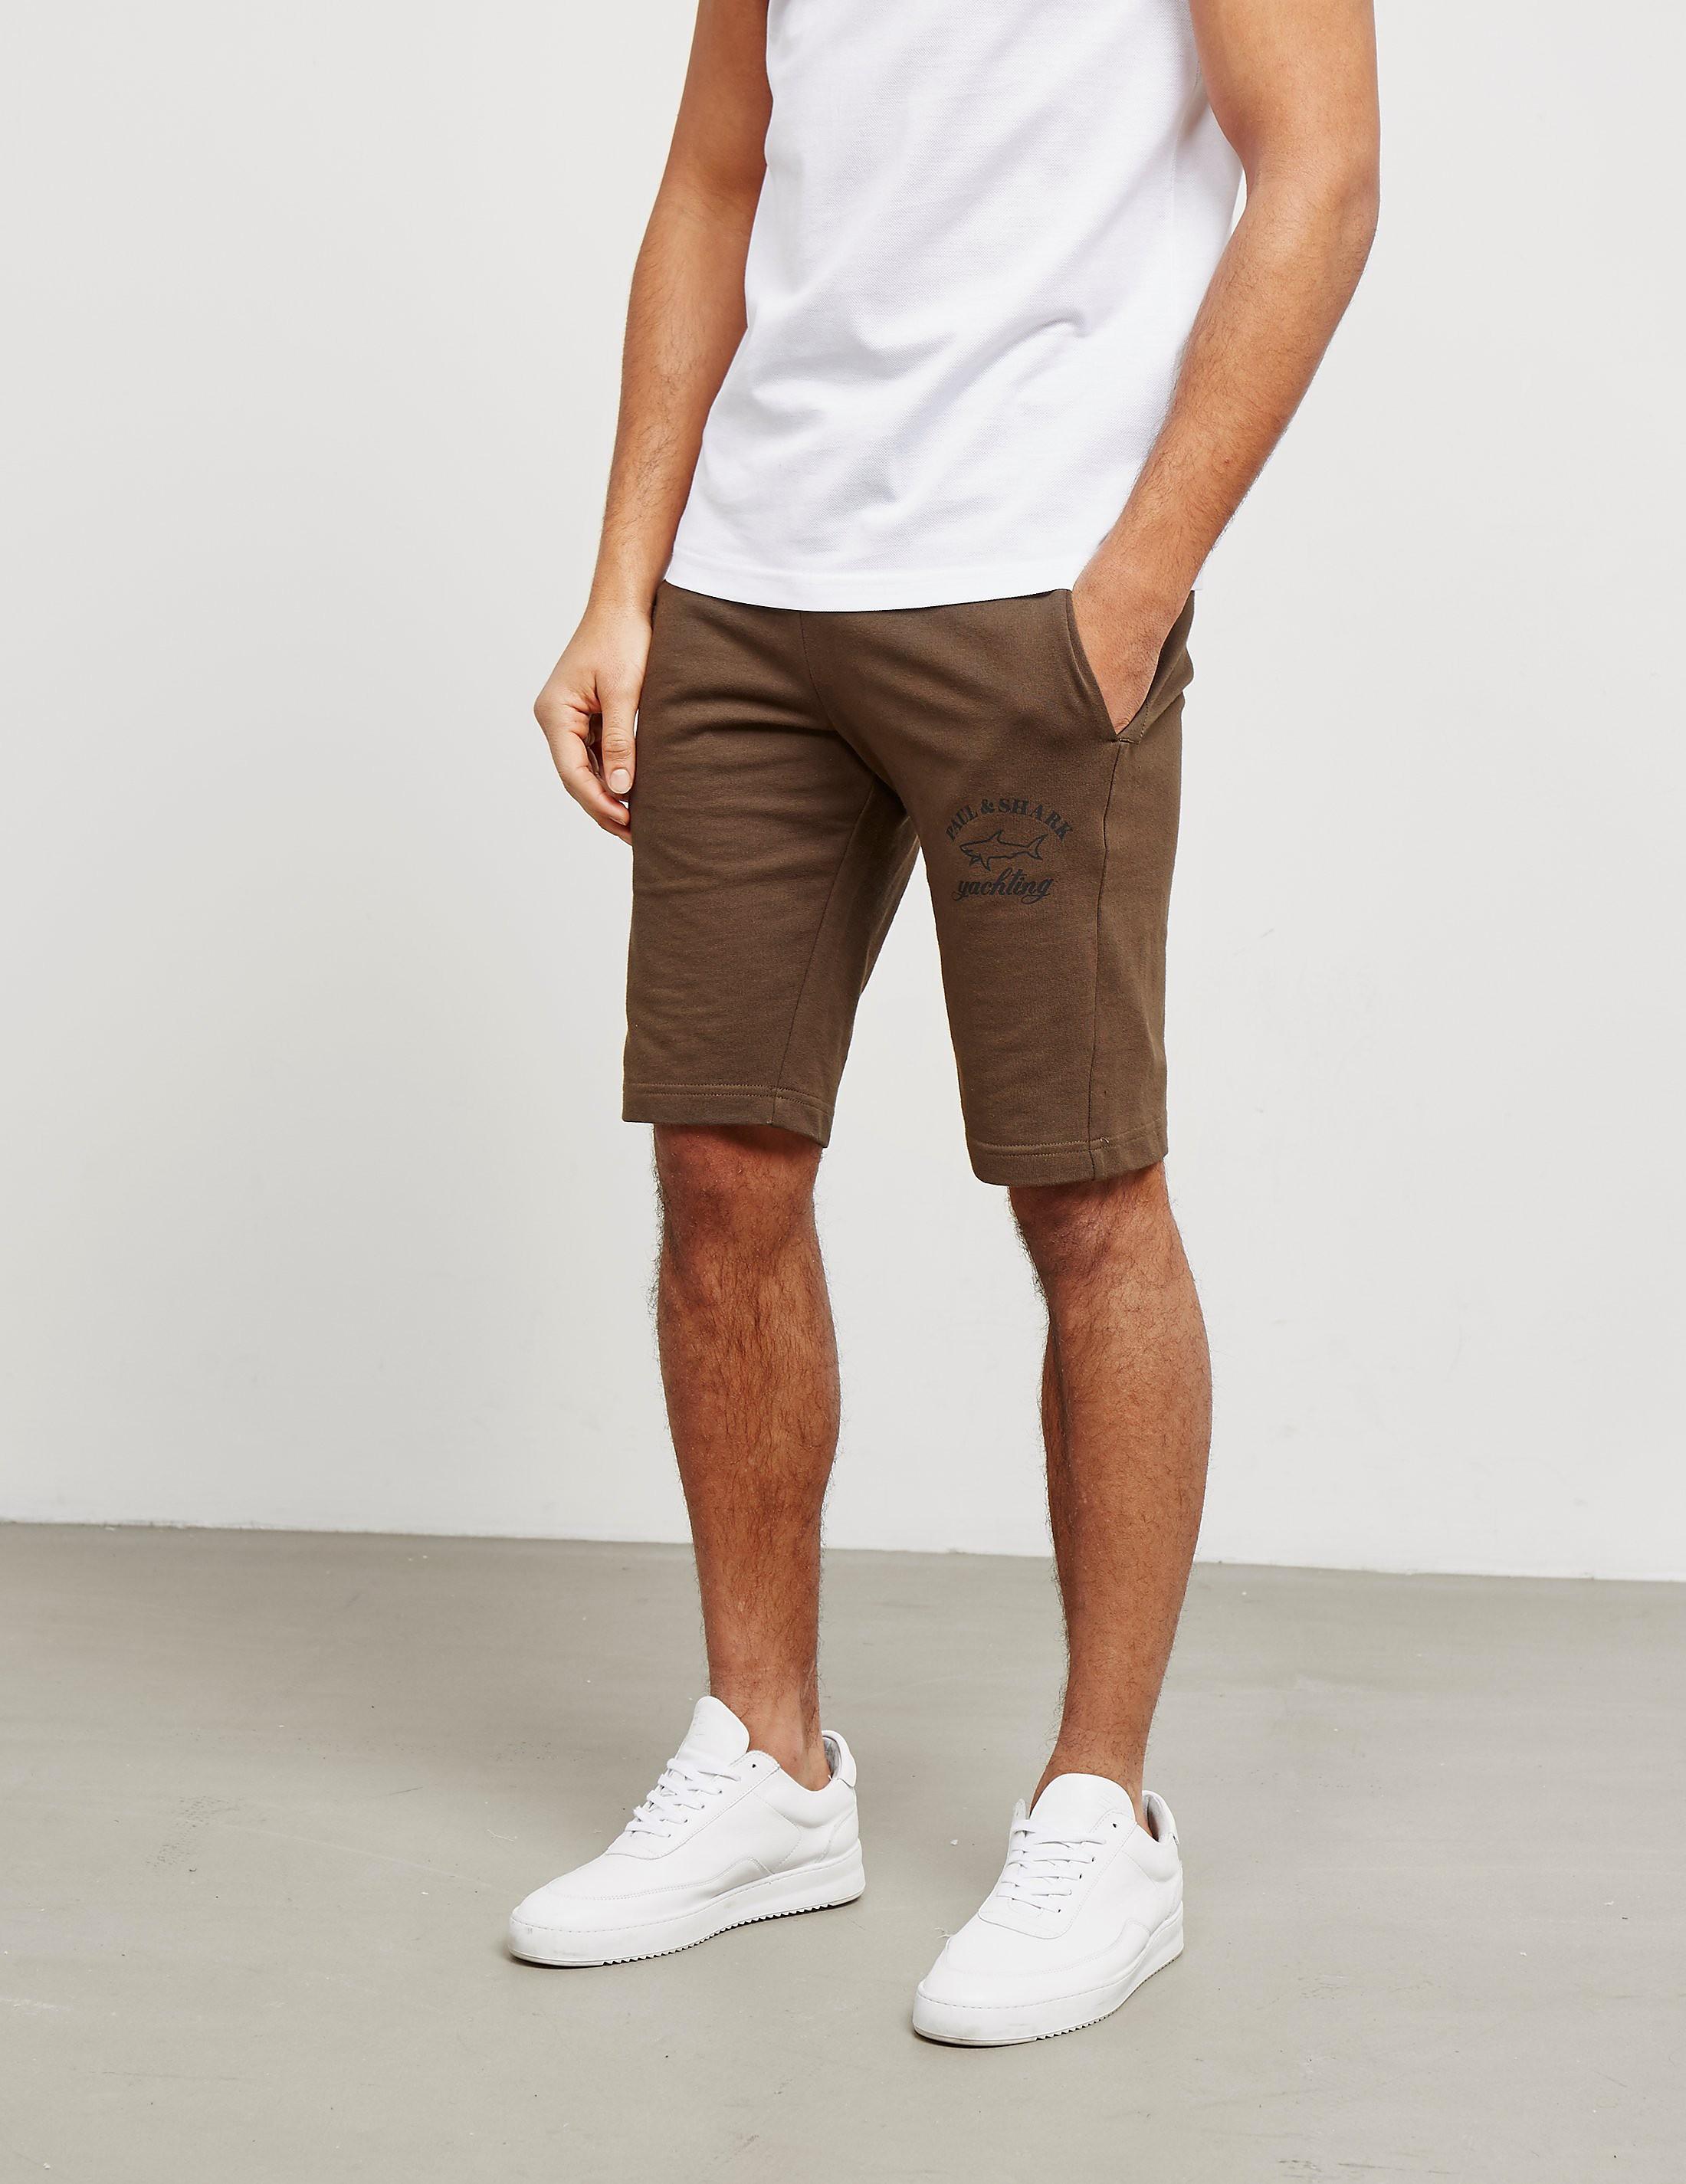 Paul and Shark Fleece Shorts - Exclusive